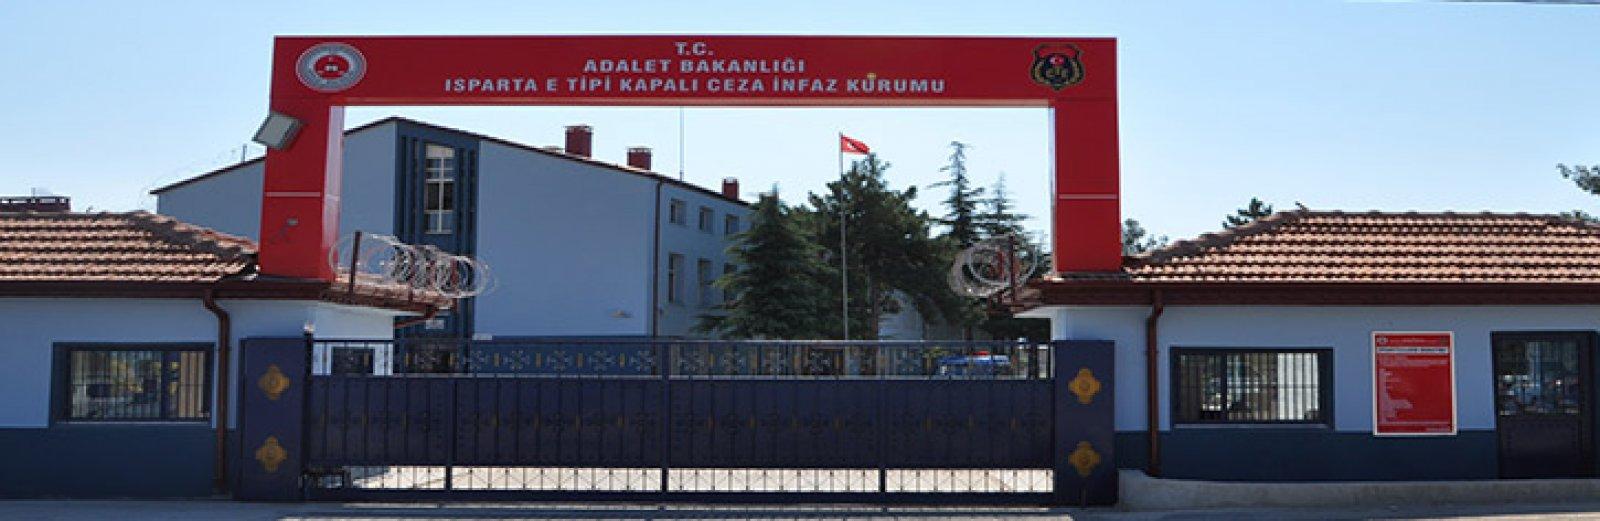 Isparta Cezaevi